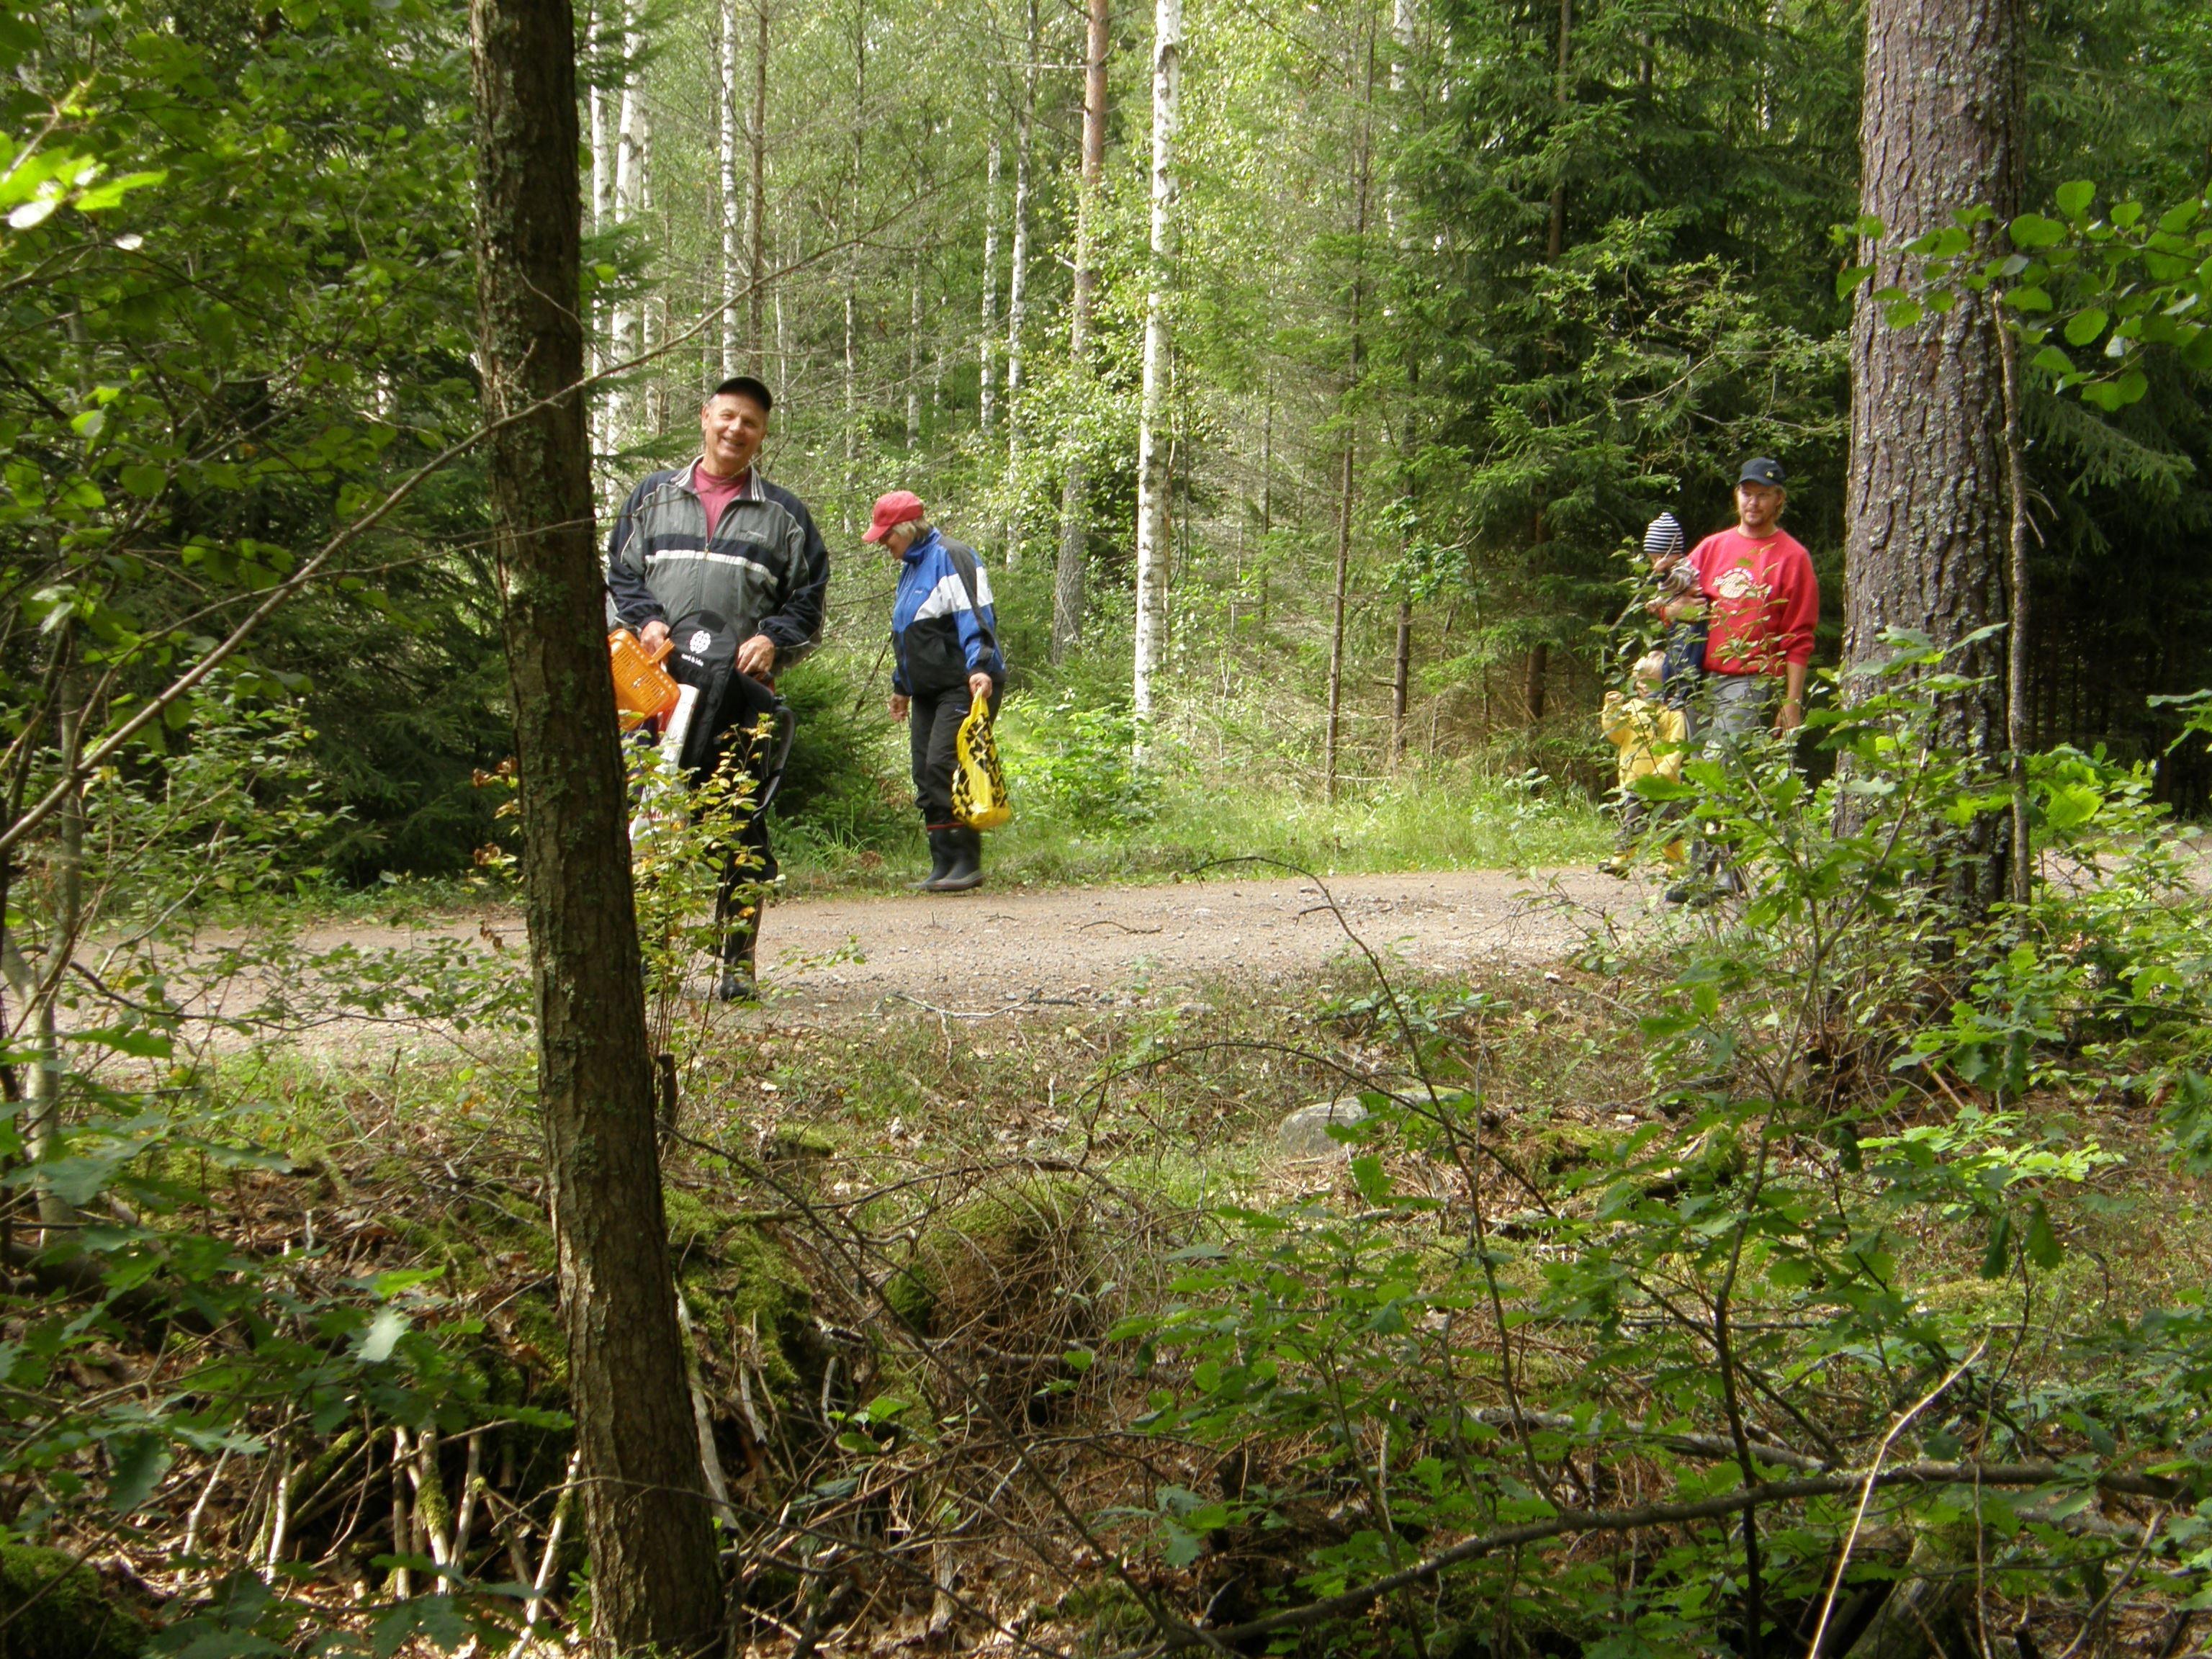 Misterhult jogging trail